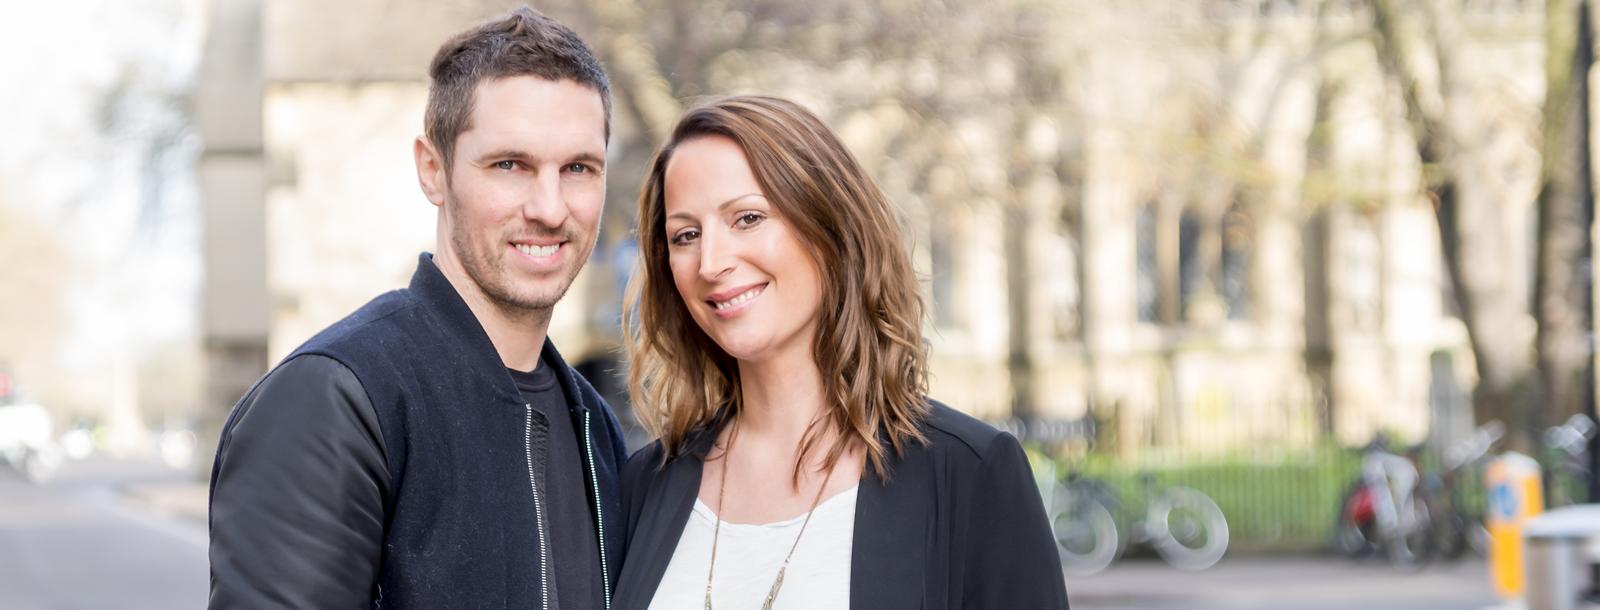 Craig & Anna Farley, Oxford Pastors